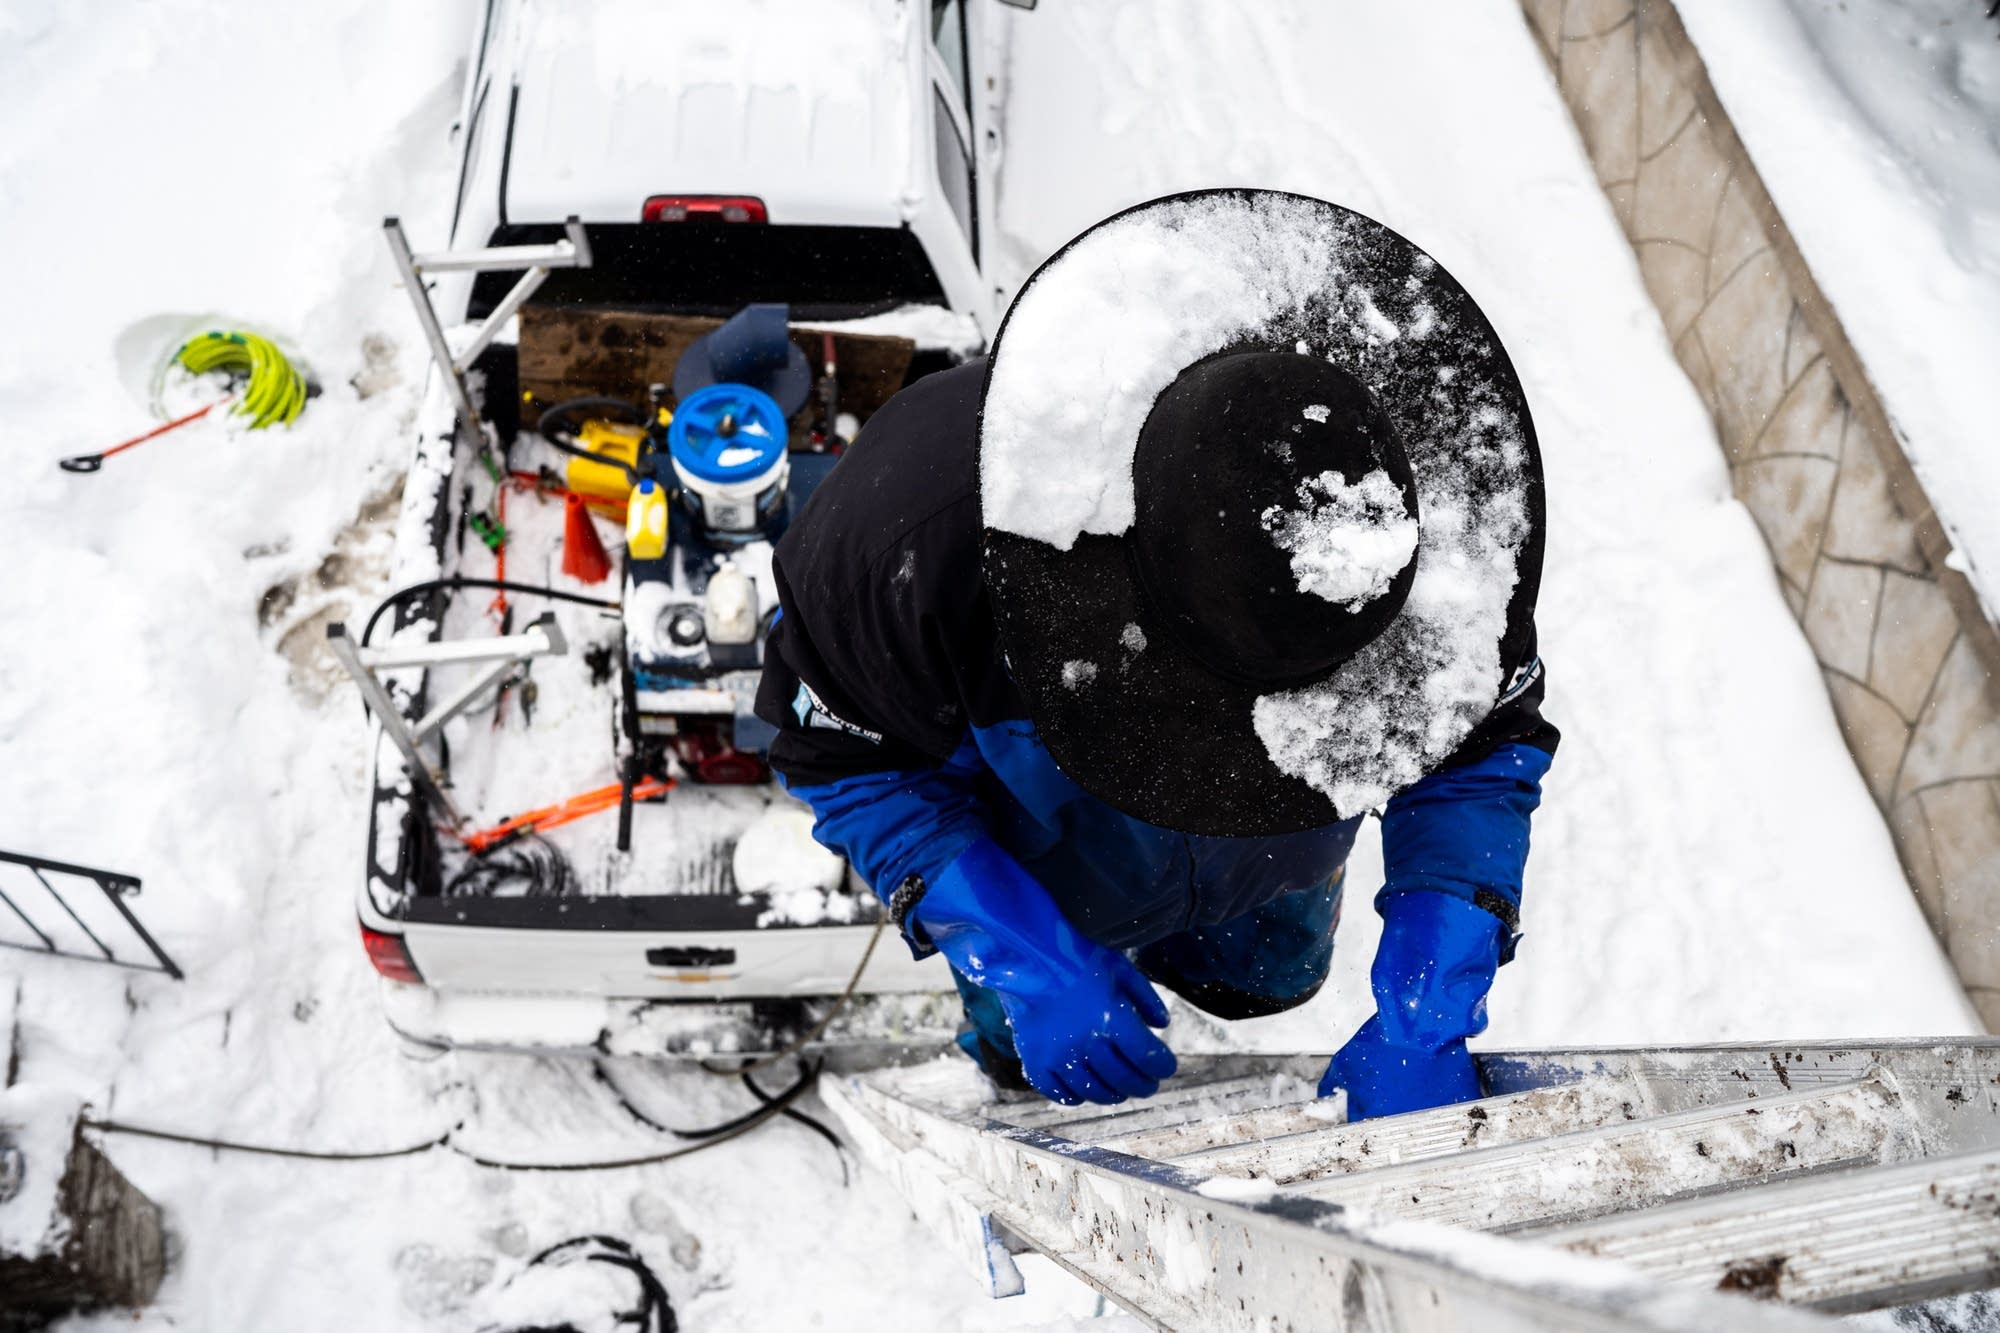 Snow falls on Jake Weber's cowboy hat as he climbs a ladder.